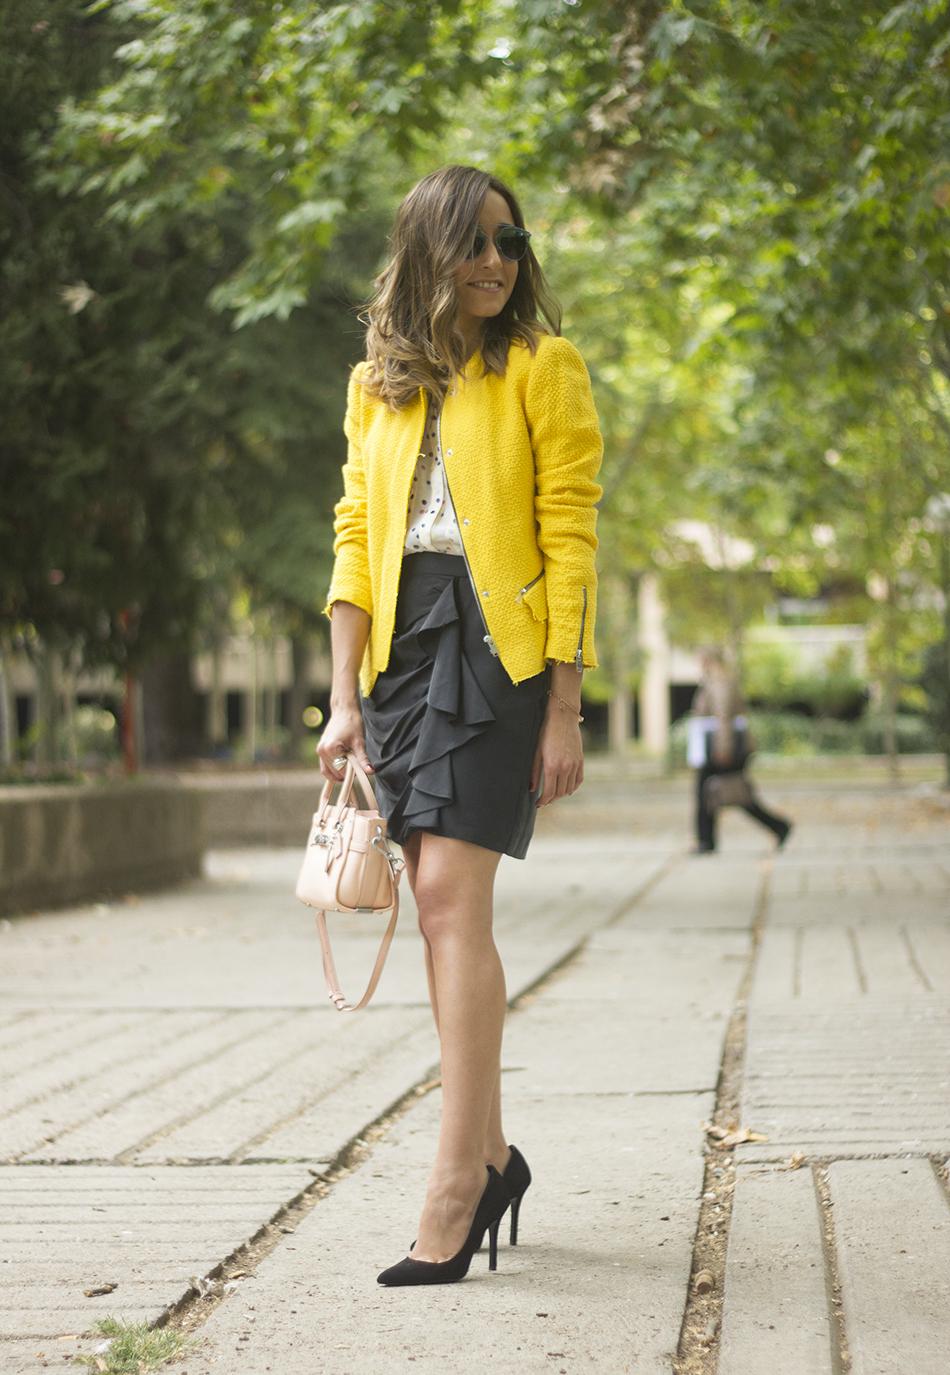 Yellow Jacket Draped Grey Skirt Outfit06